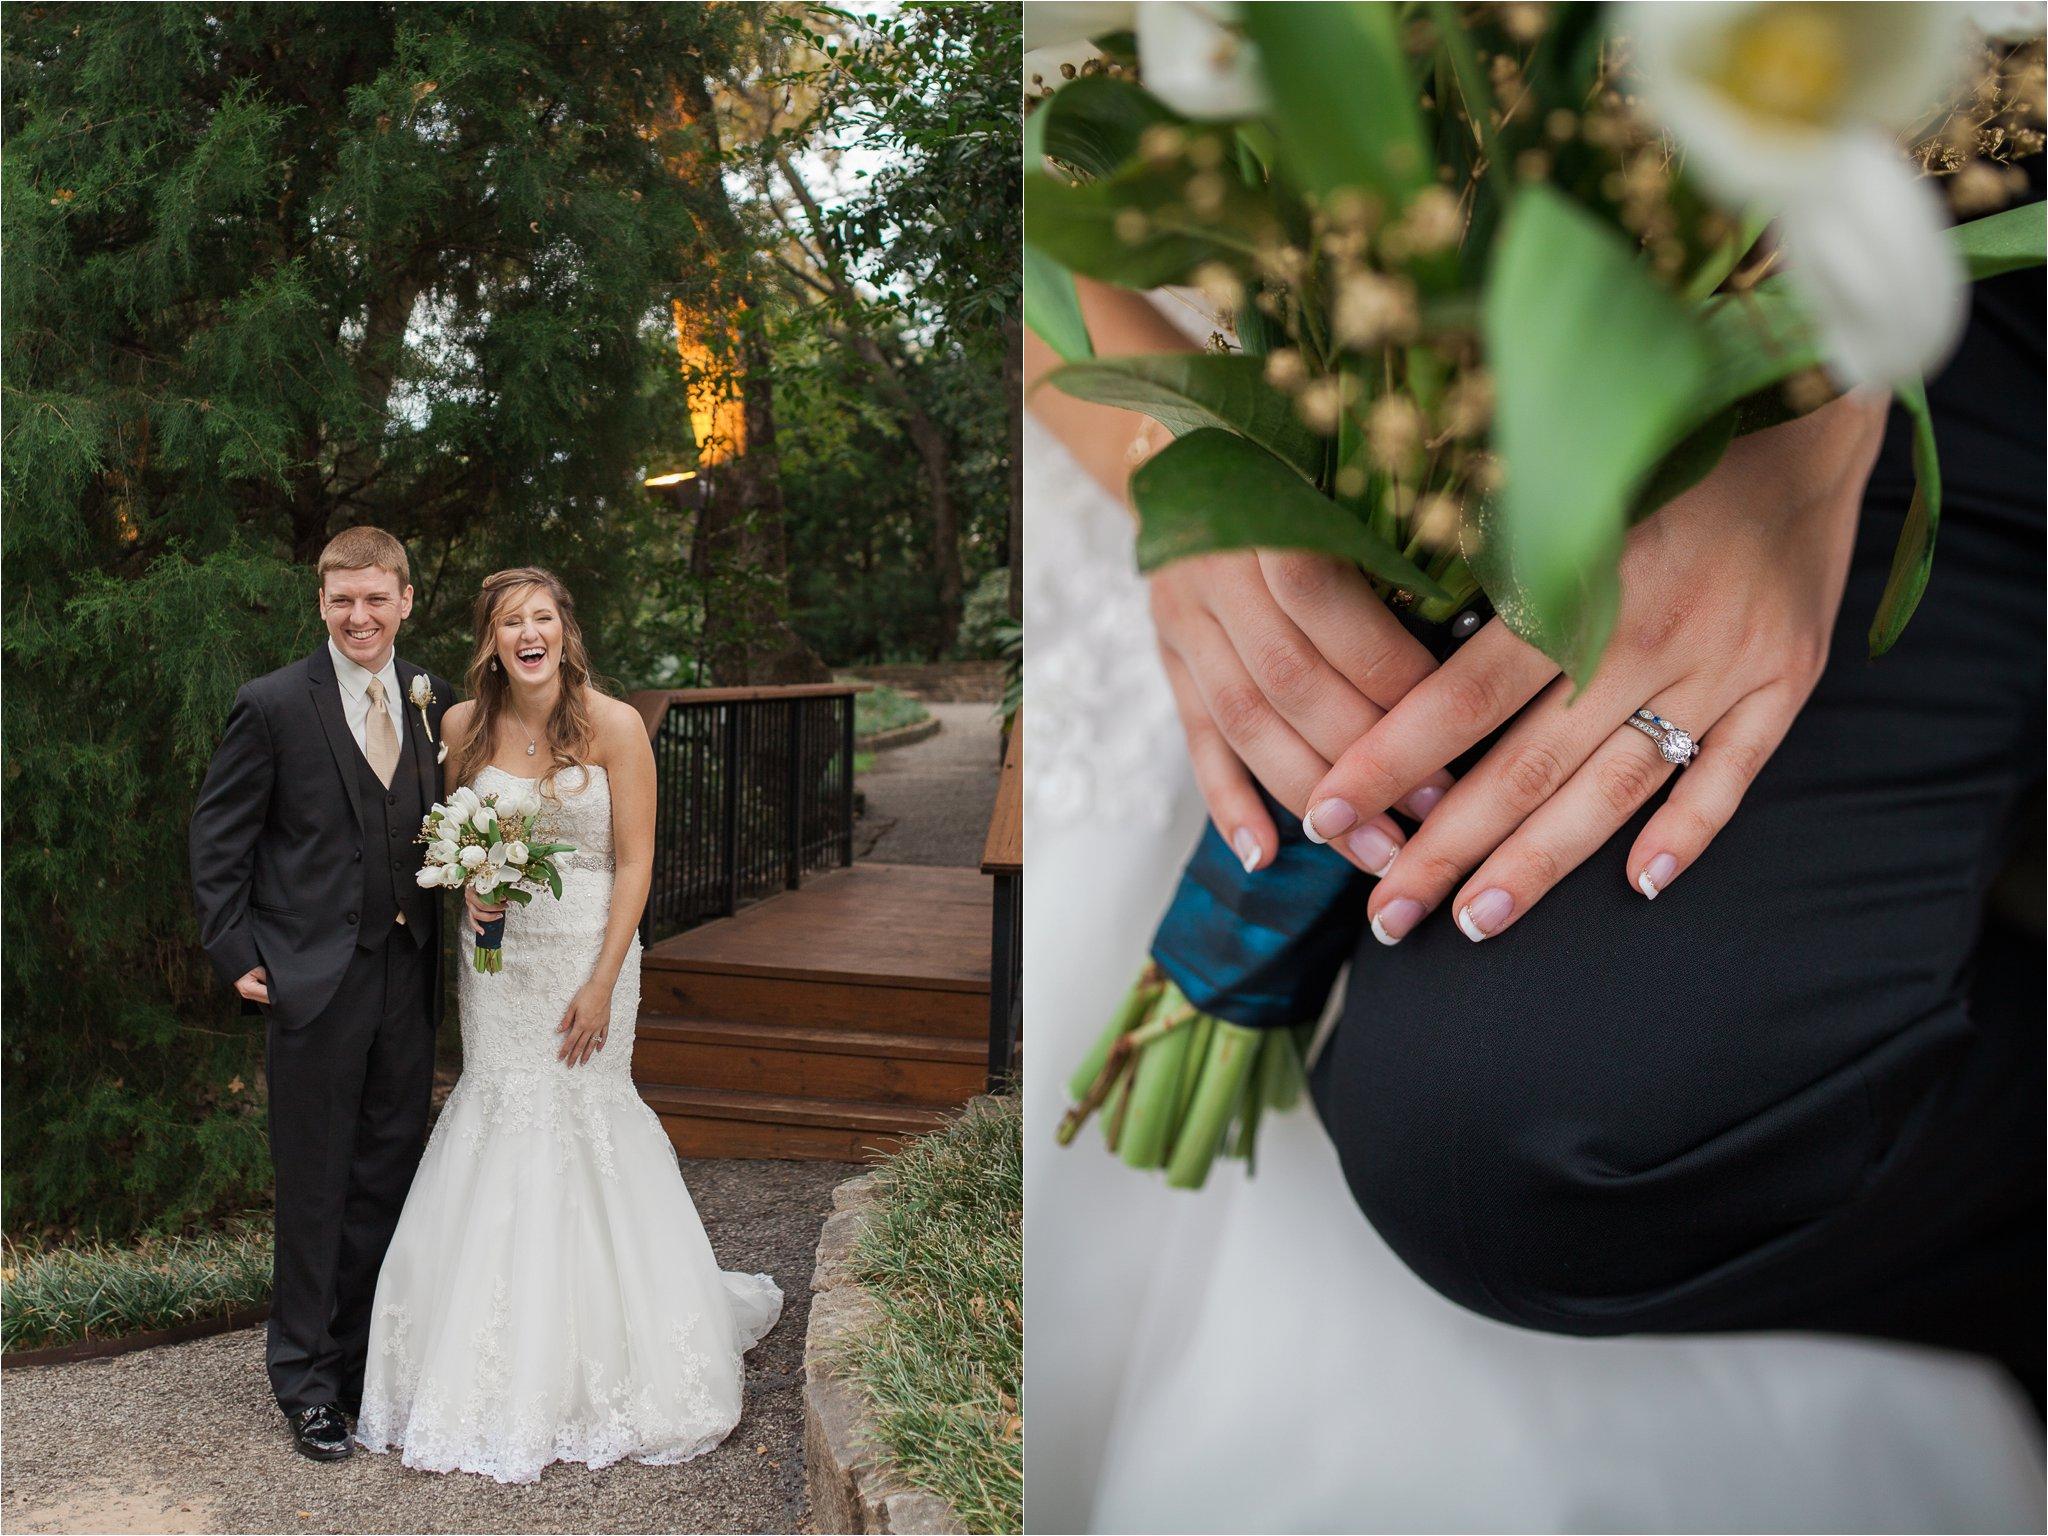 lunsford-wedding-710.jpg